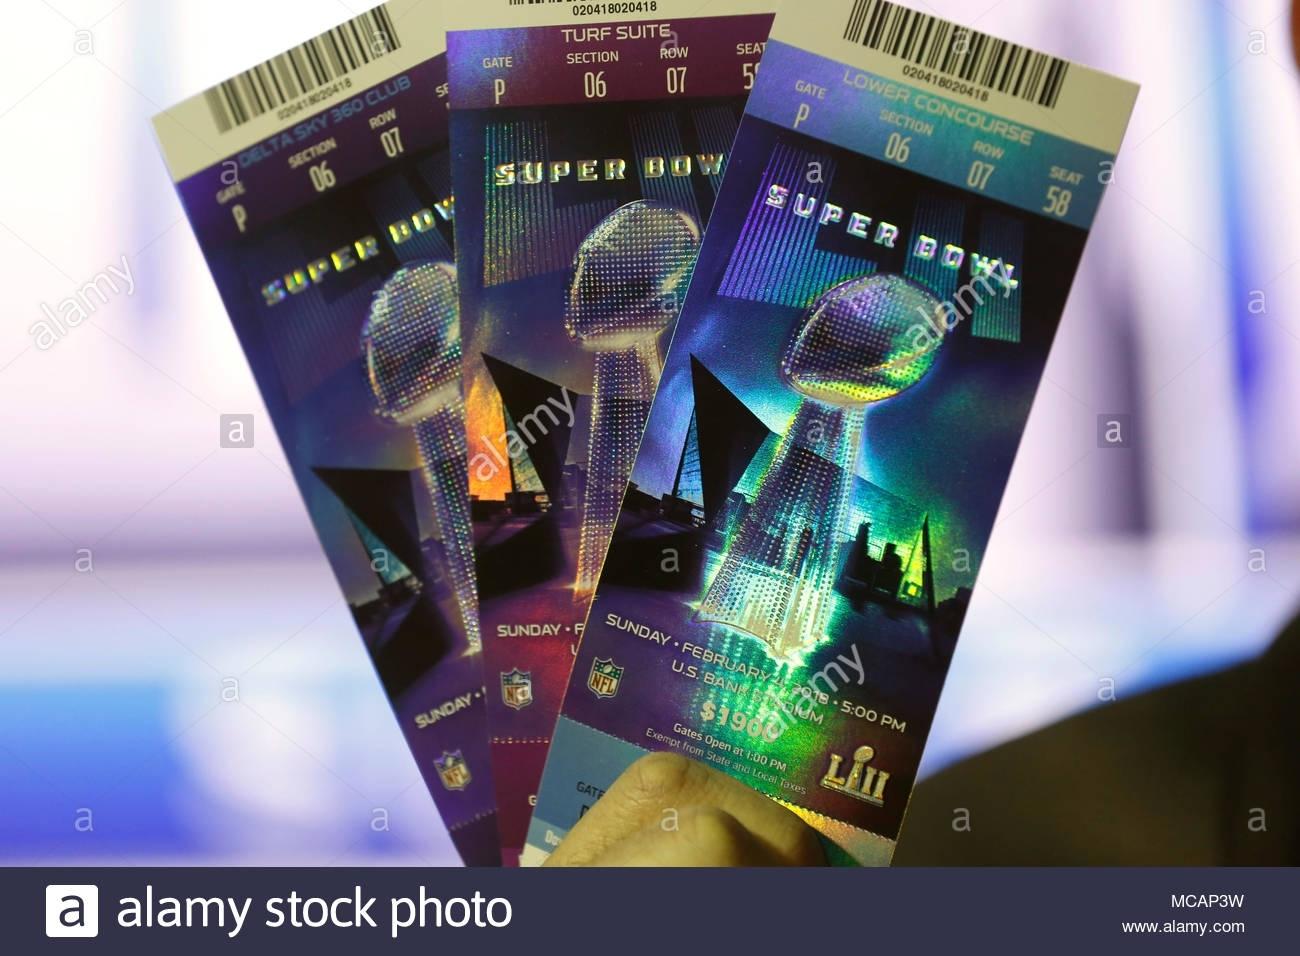 Super Bowl Lii Tickets Stockfotos & Super Bowl Lii Tickets for Super Bowl Tickets 2018